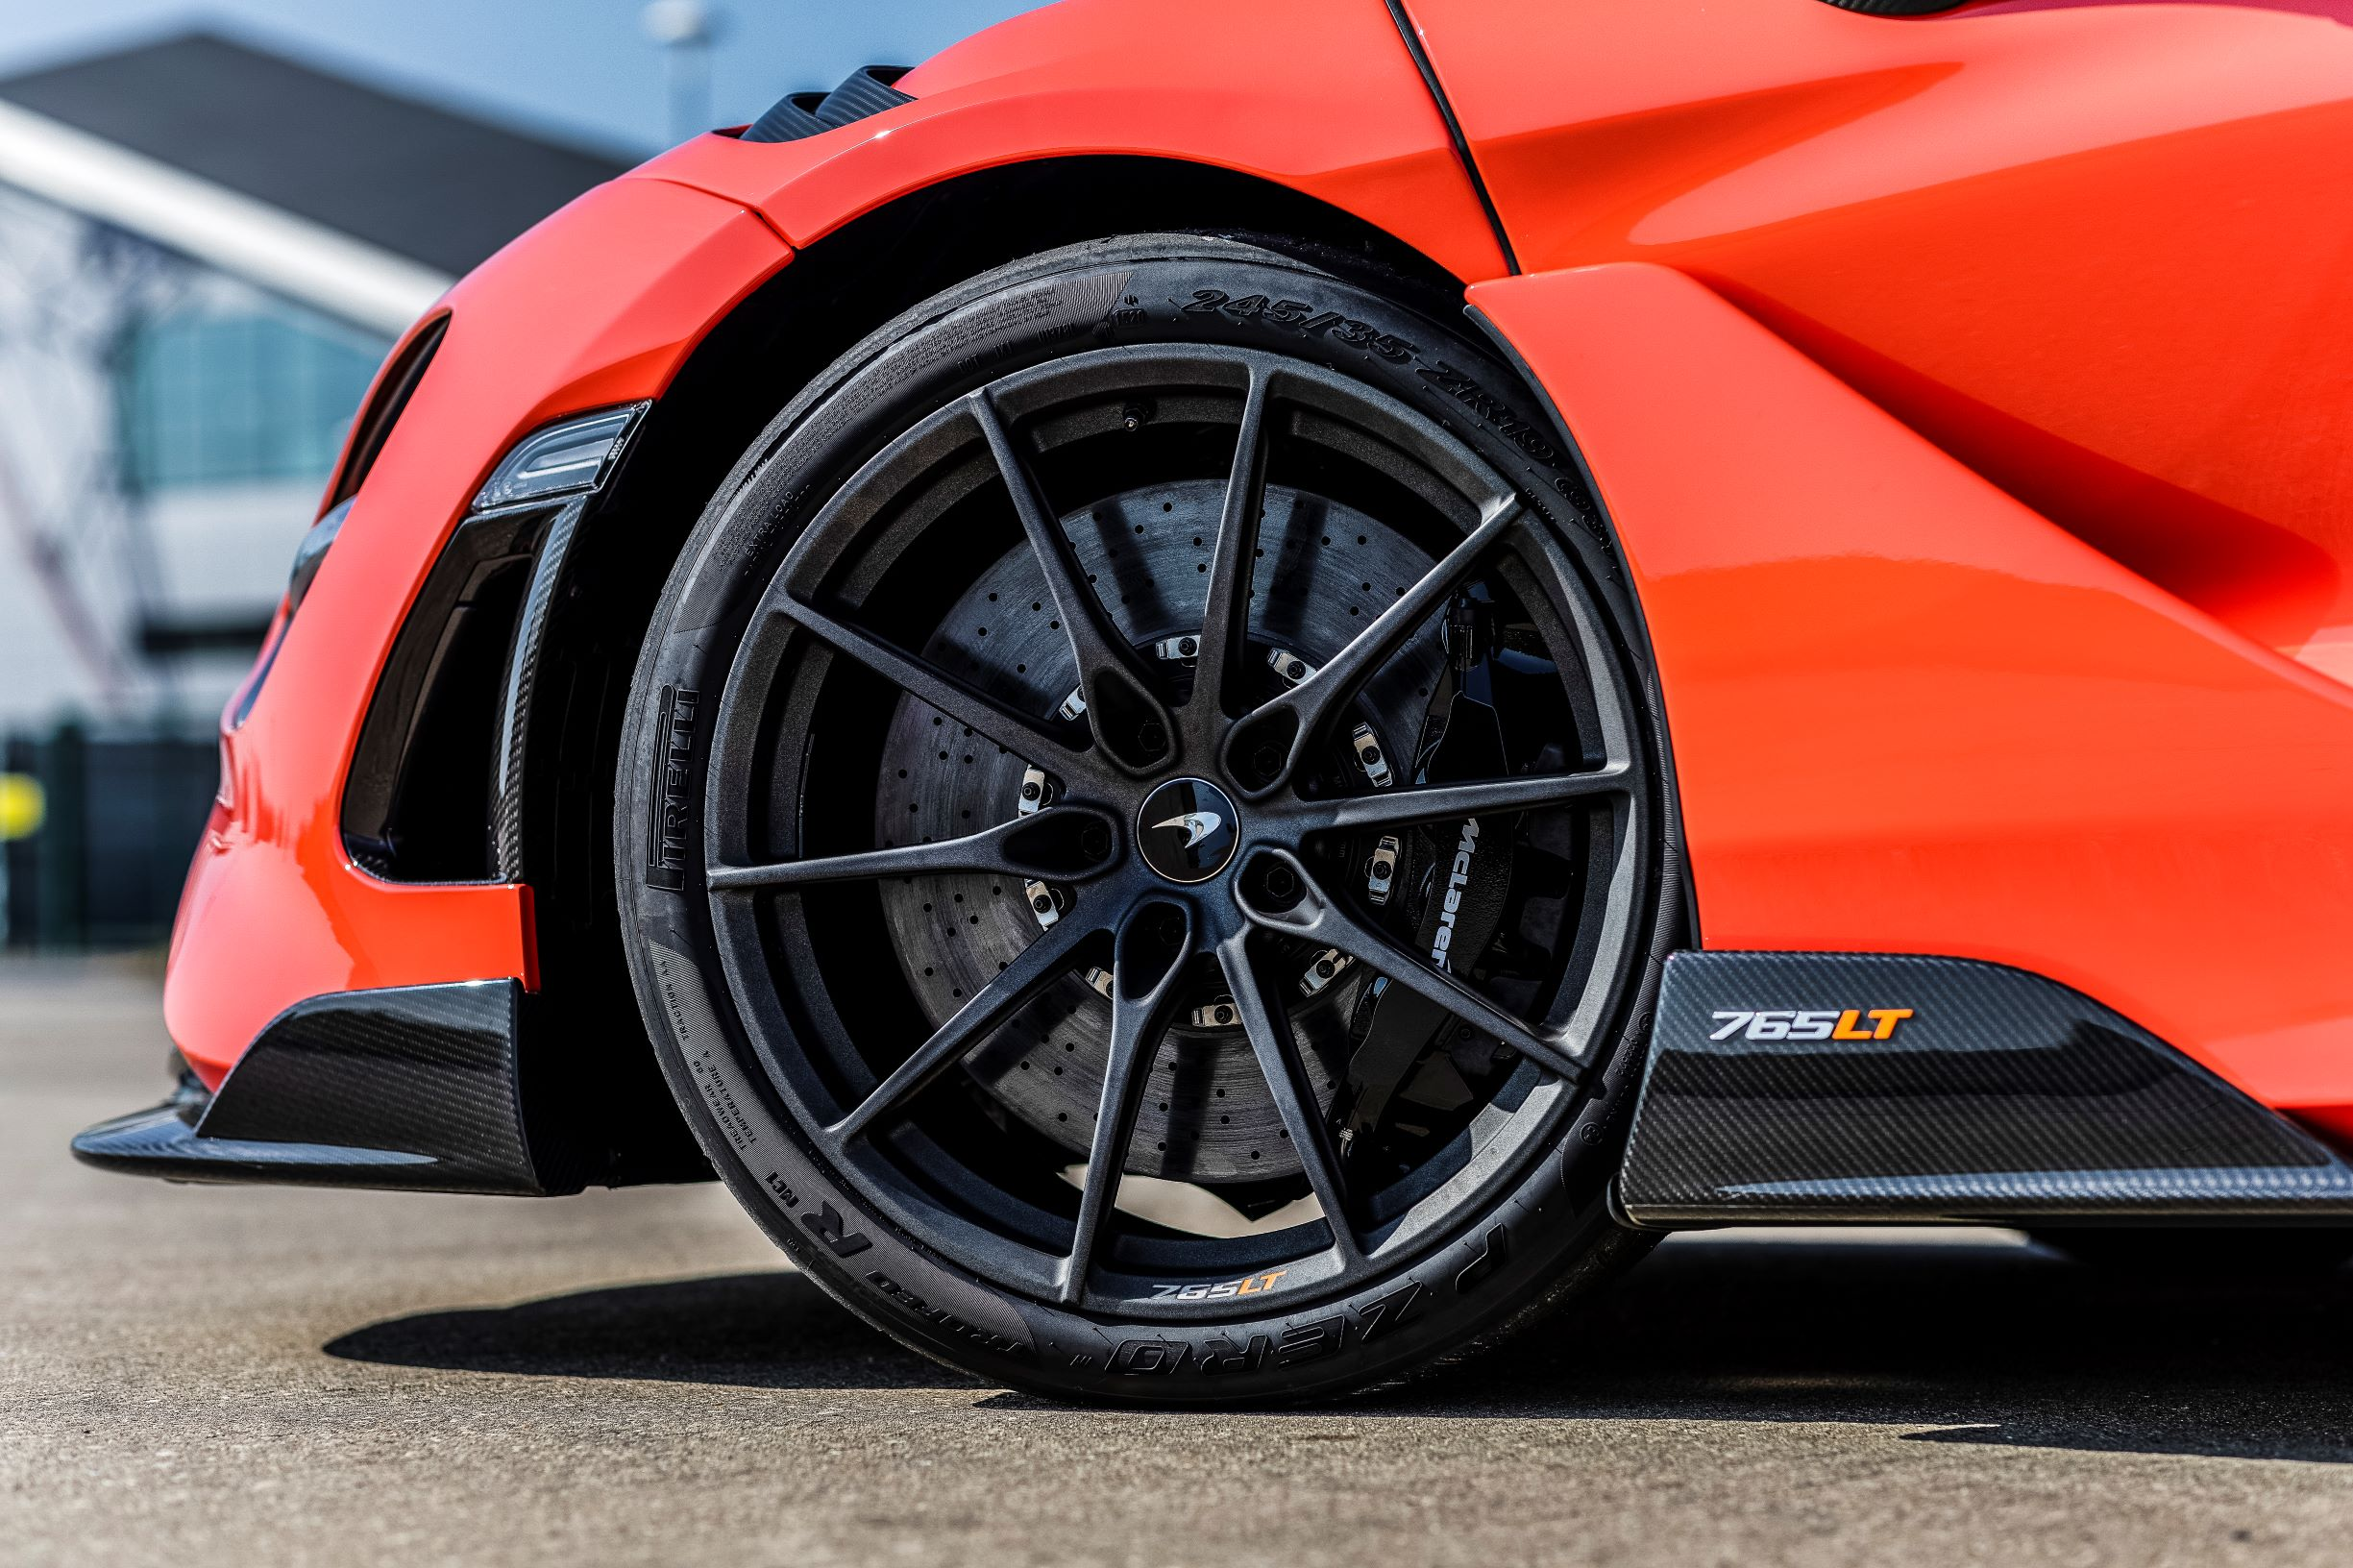 PIRELLI LAUNCHES NEW P ZERO TROFEO R FOR THE FASTEST-EVER McLAREN SUPER SERIES CAR